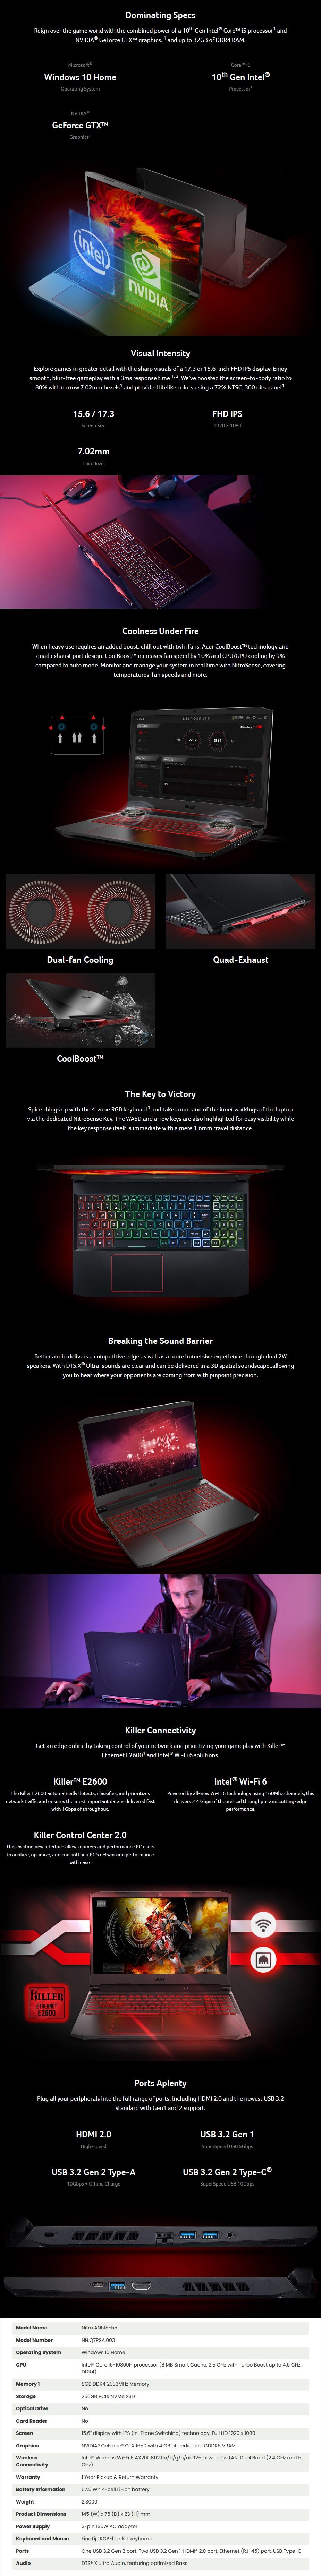 acer-nitro-5-156-laptop-i510300h-8gb-256gb-gtx1650-win10-home-ac37224-6.jpg